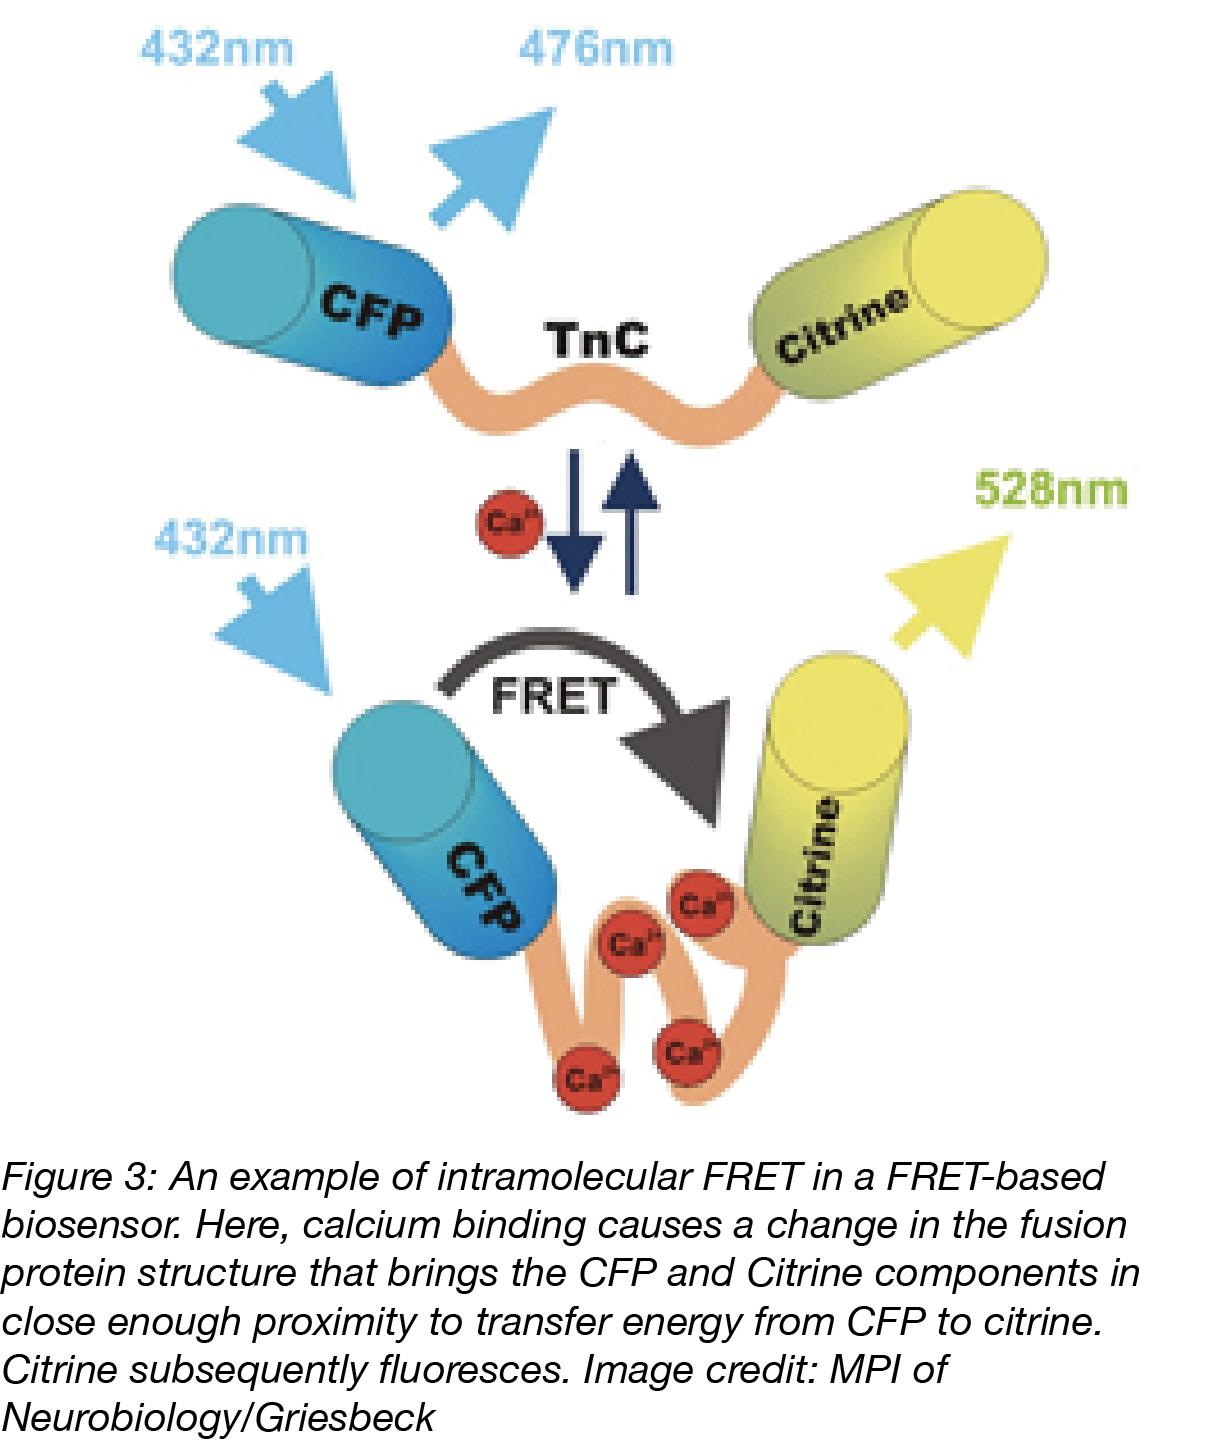 Intramolecular FRET Biosensor